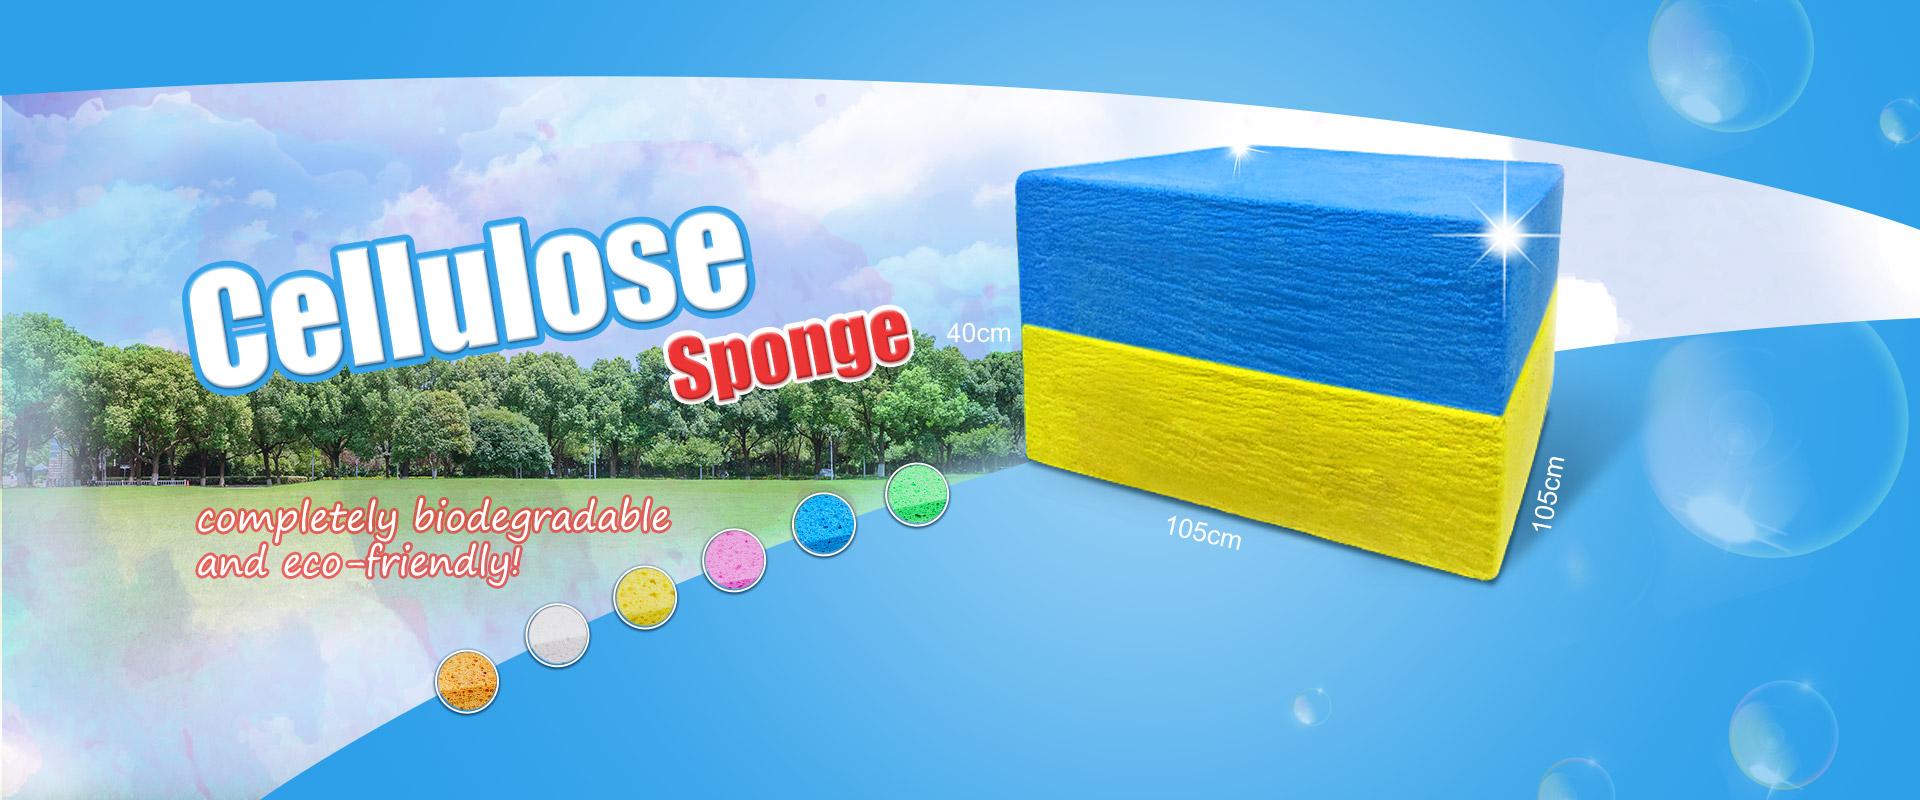 cellulose sponge